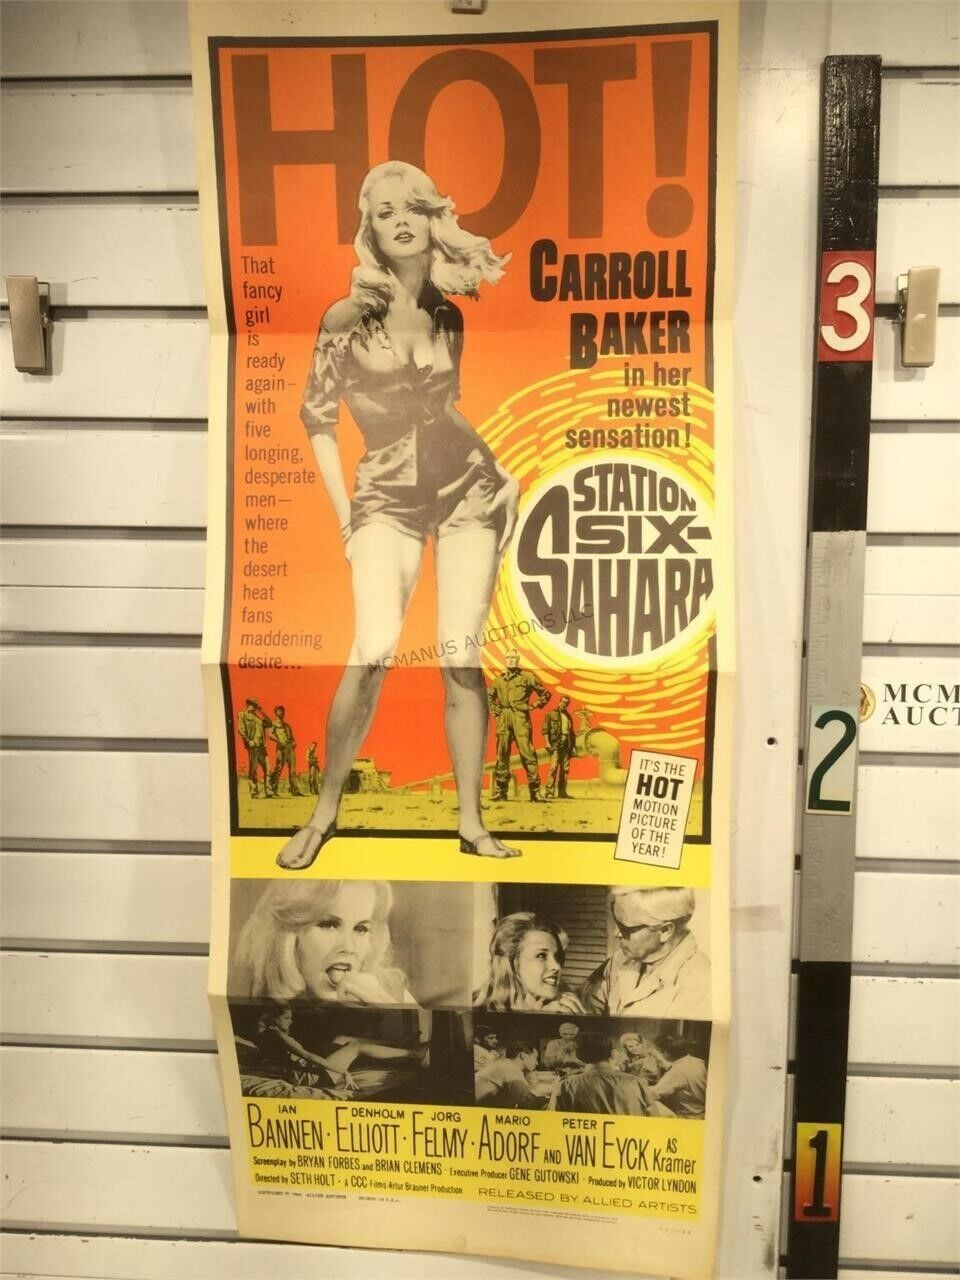 1964 Station Six-Sahara Movie Poster 14 X 36 Starring Carroll Baker - $22.50